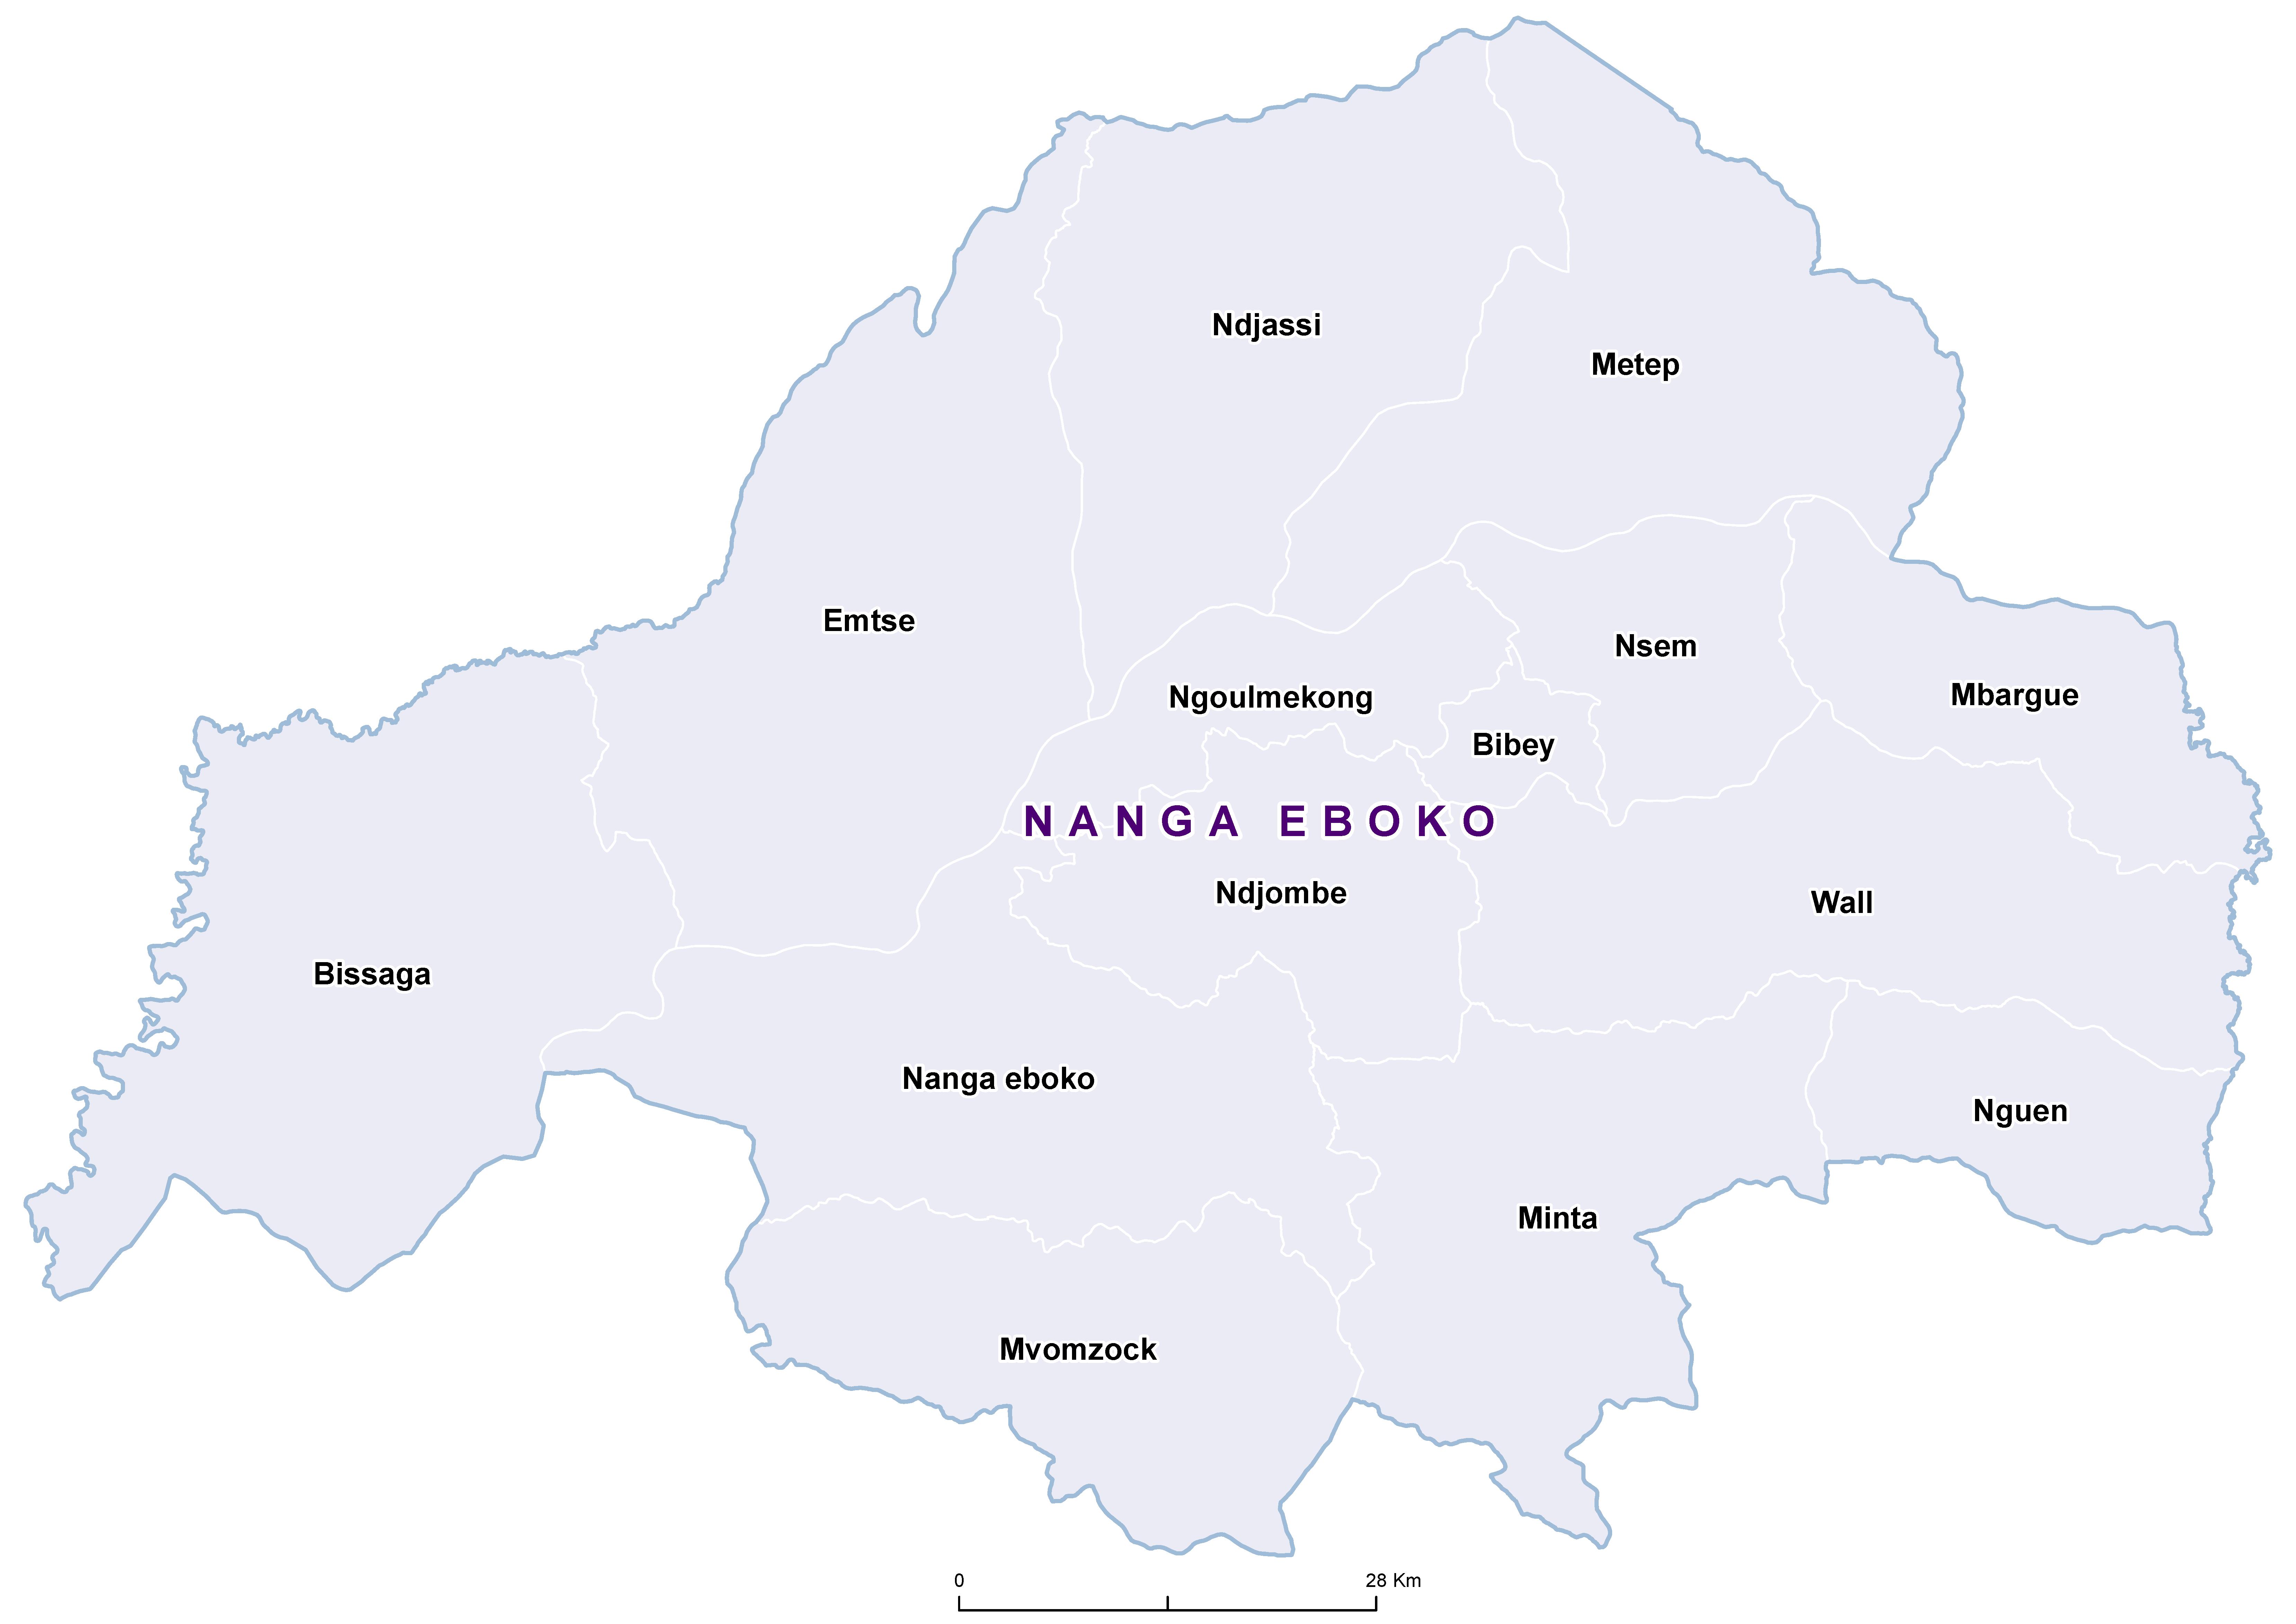 Nanga eboko SCH 20180001